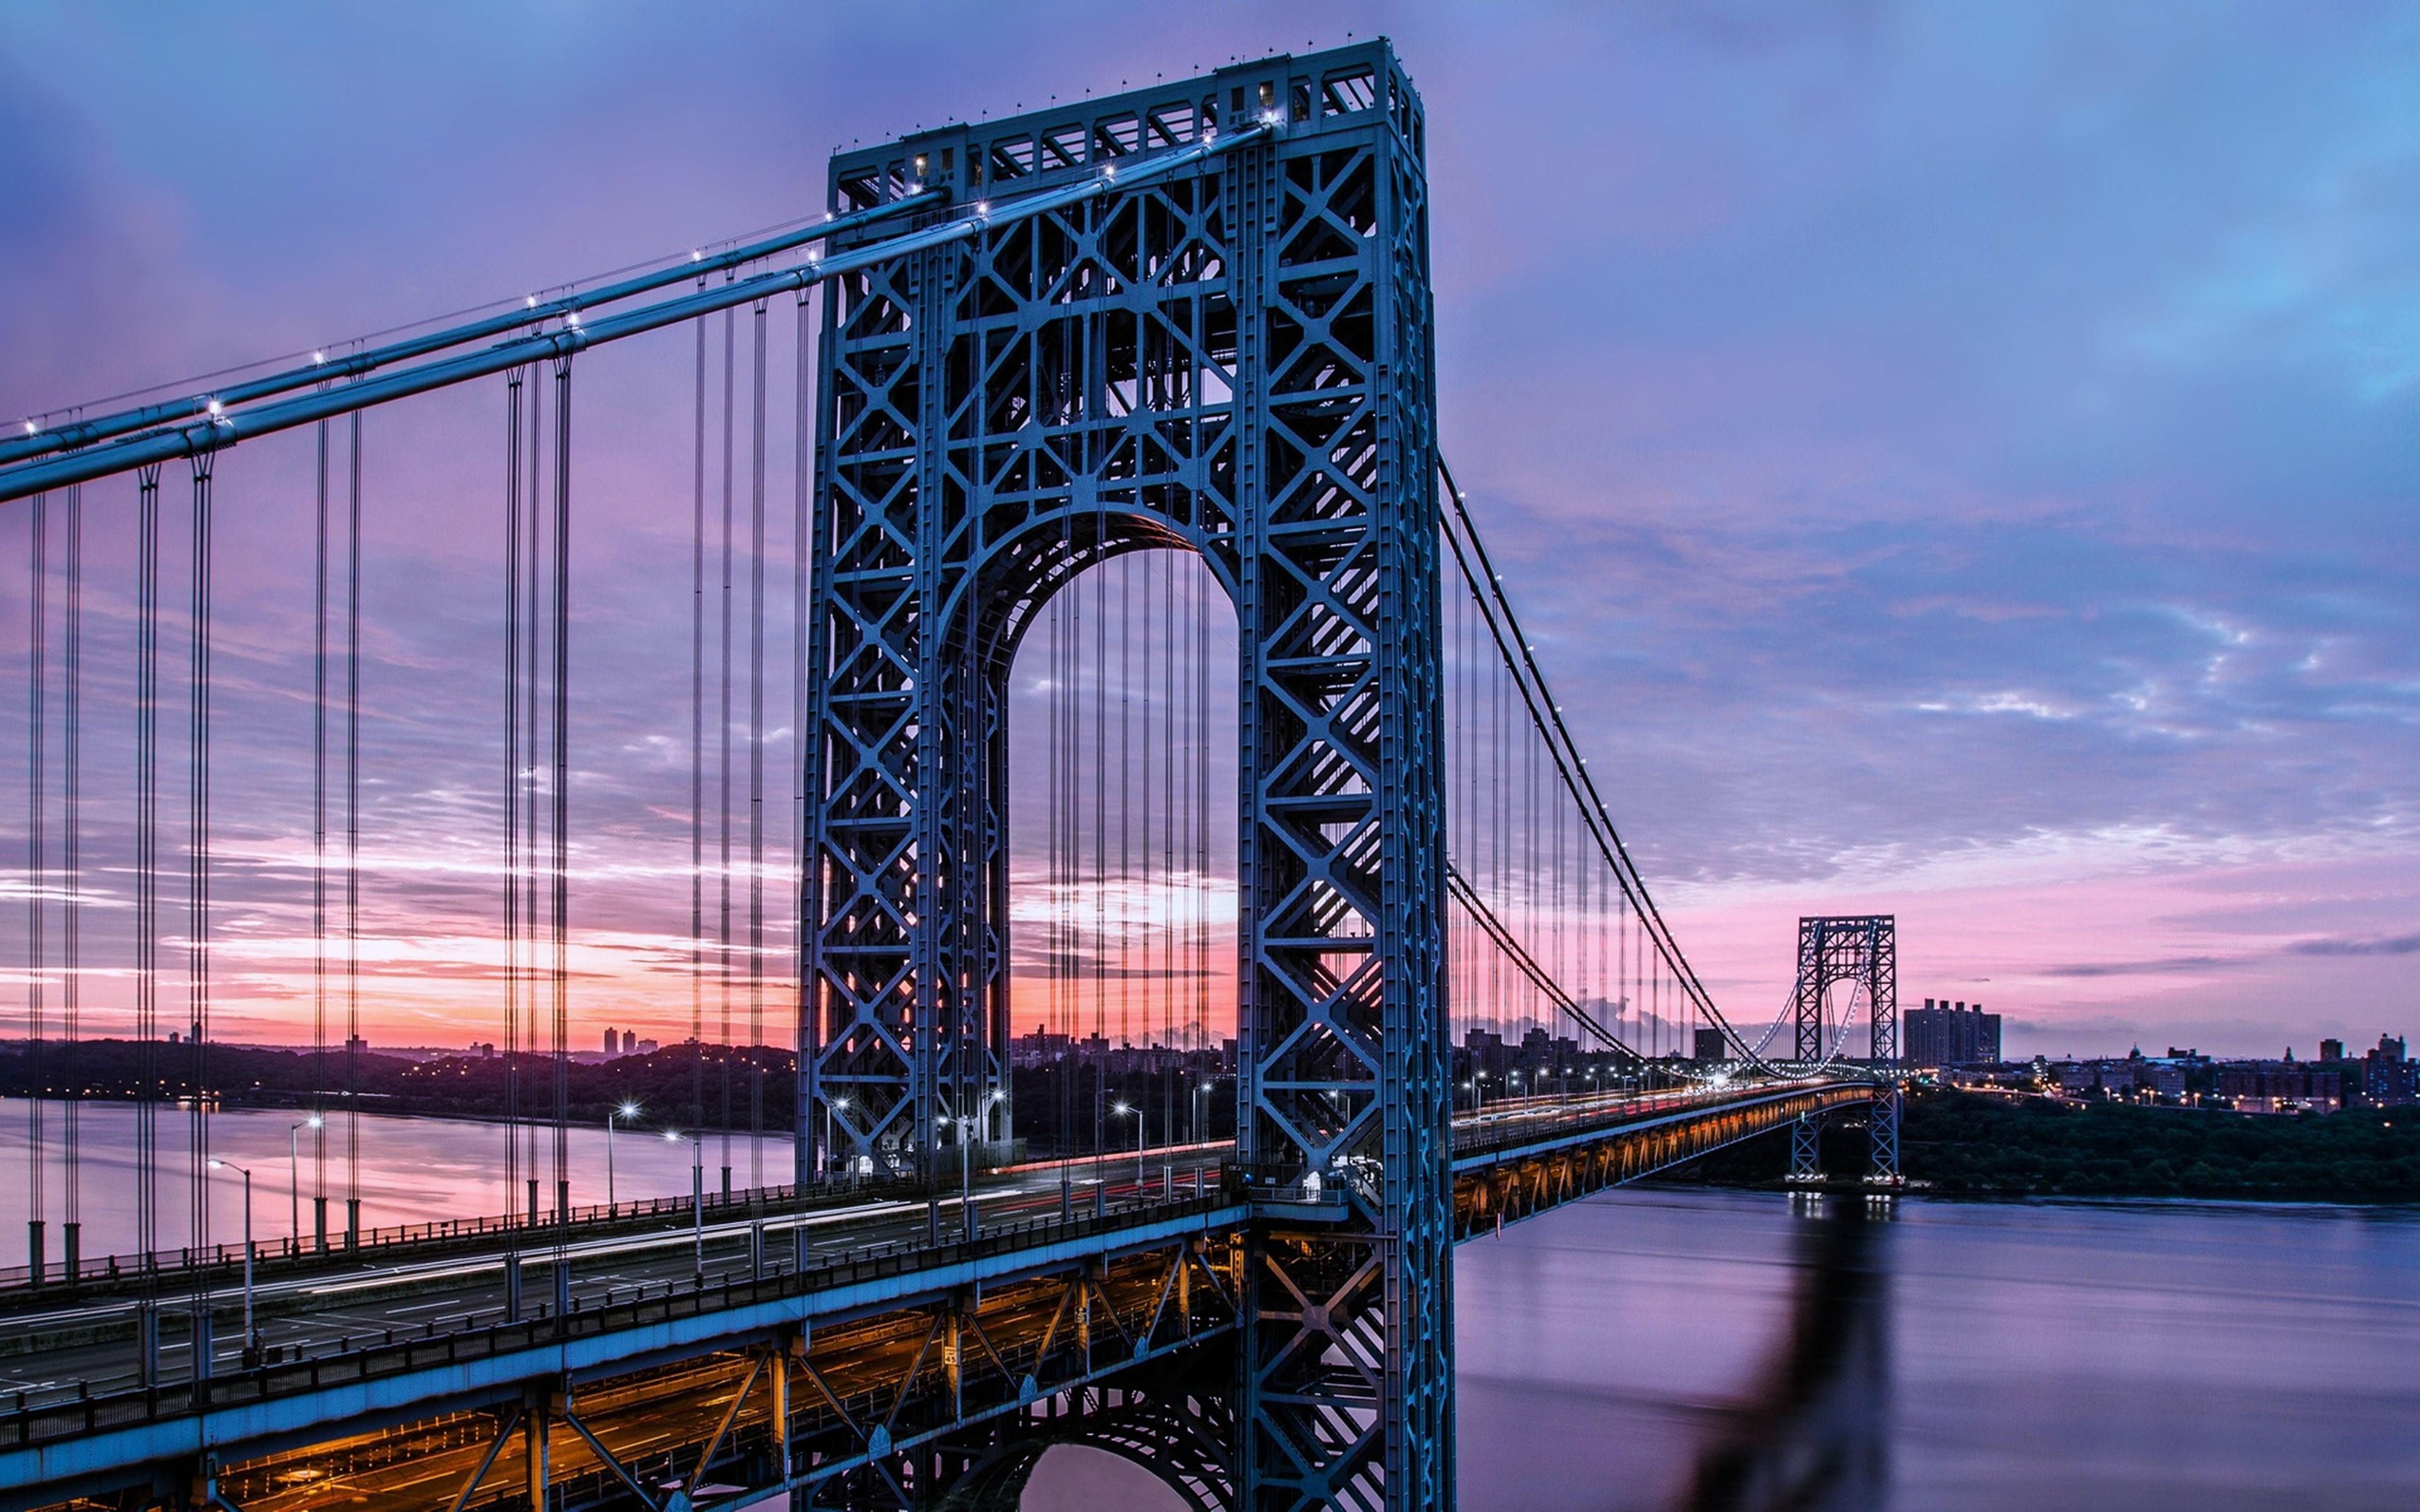 George Washington Bridge Wallpaper 18   3840 X 2400 stmednet 3840x2400